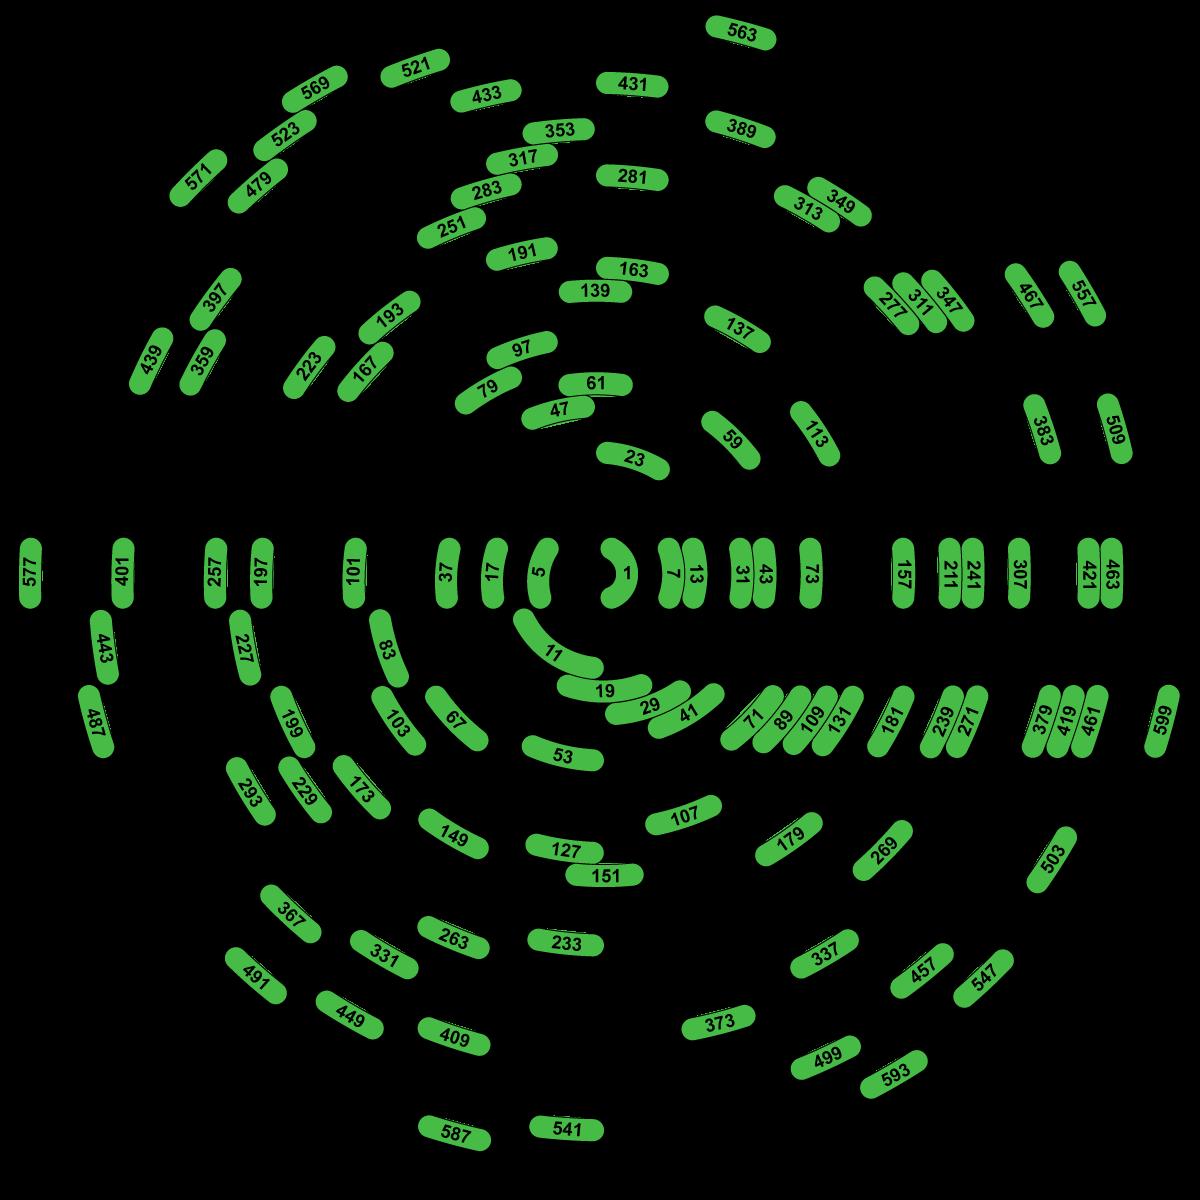 dipolar-spiral-layer2-2021